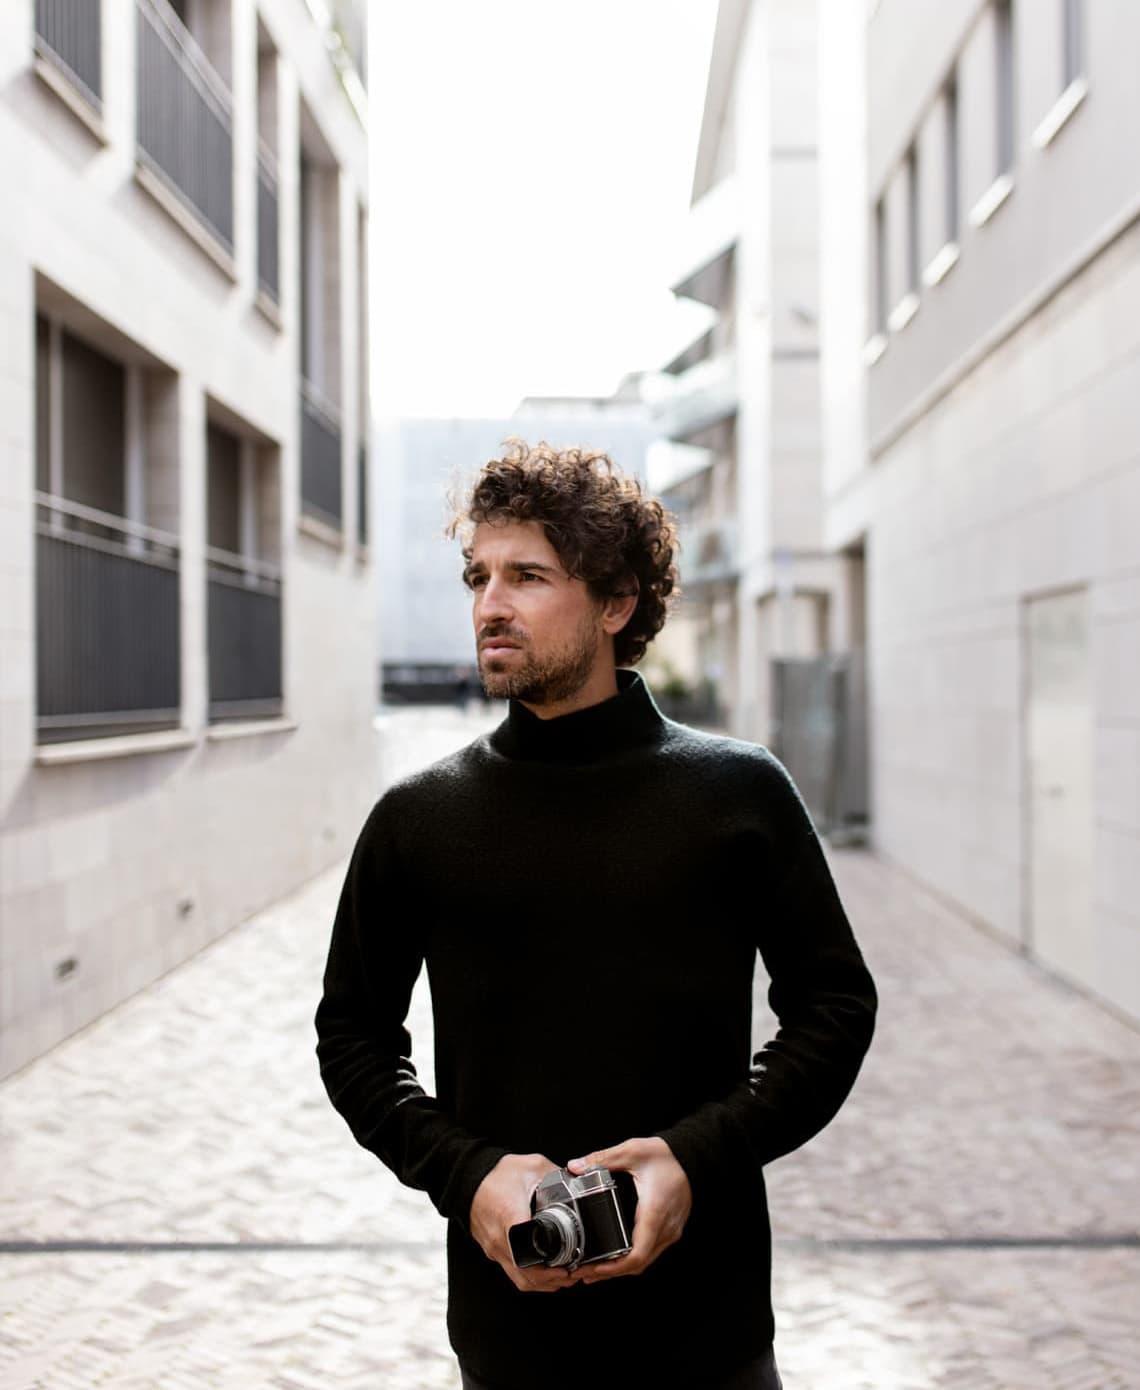 webseite-HolgerAltgeld-SebastianStache-002-1